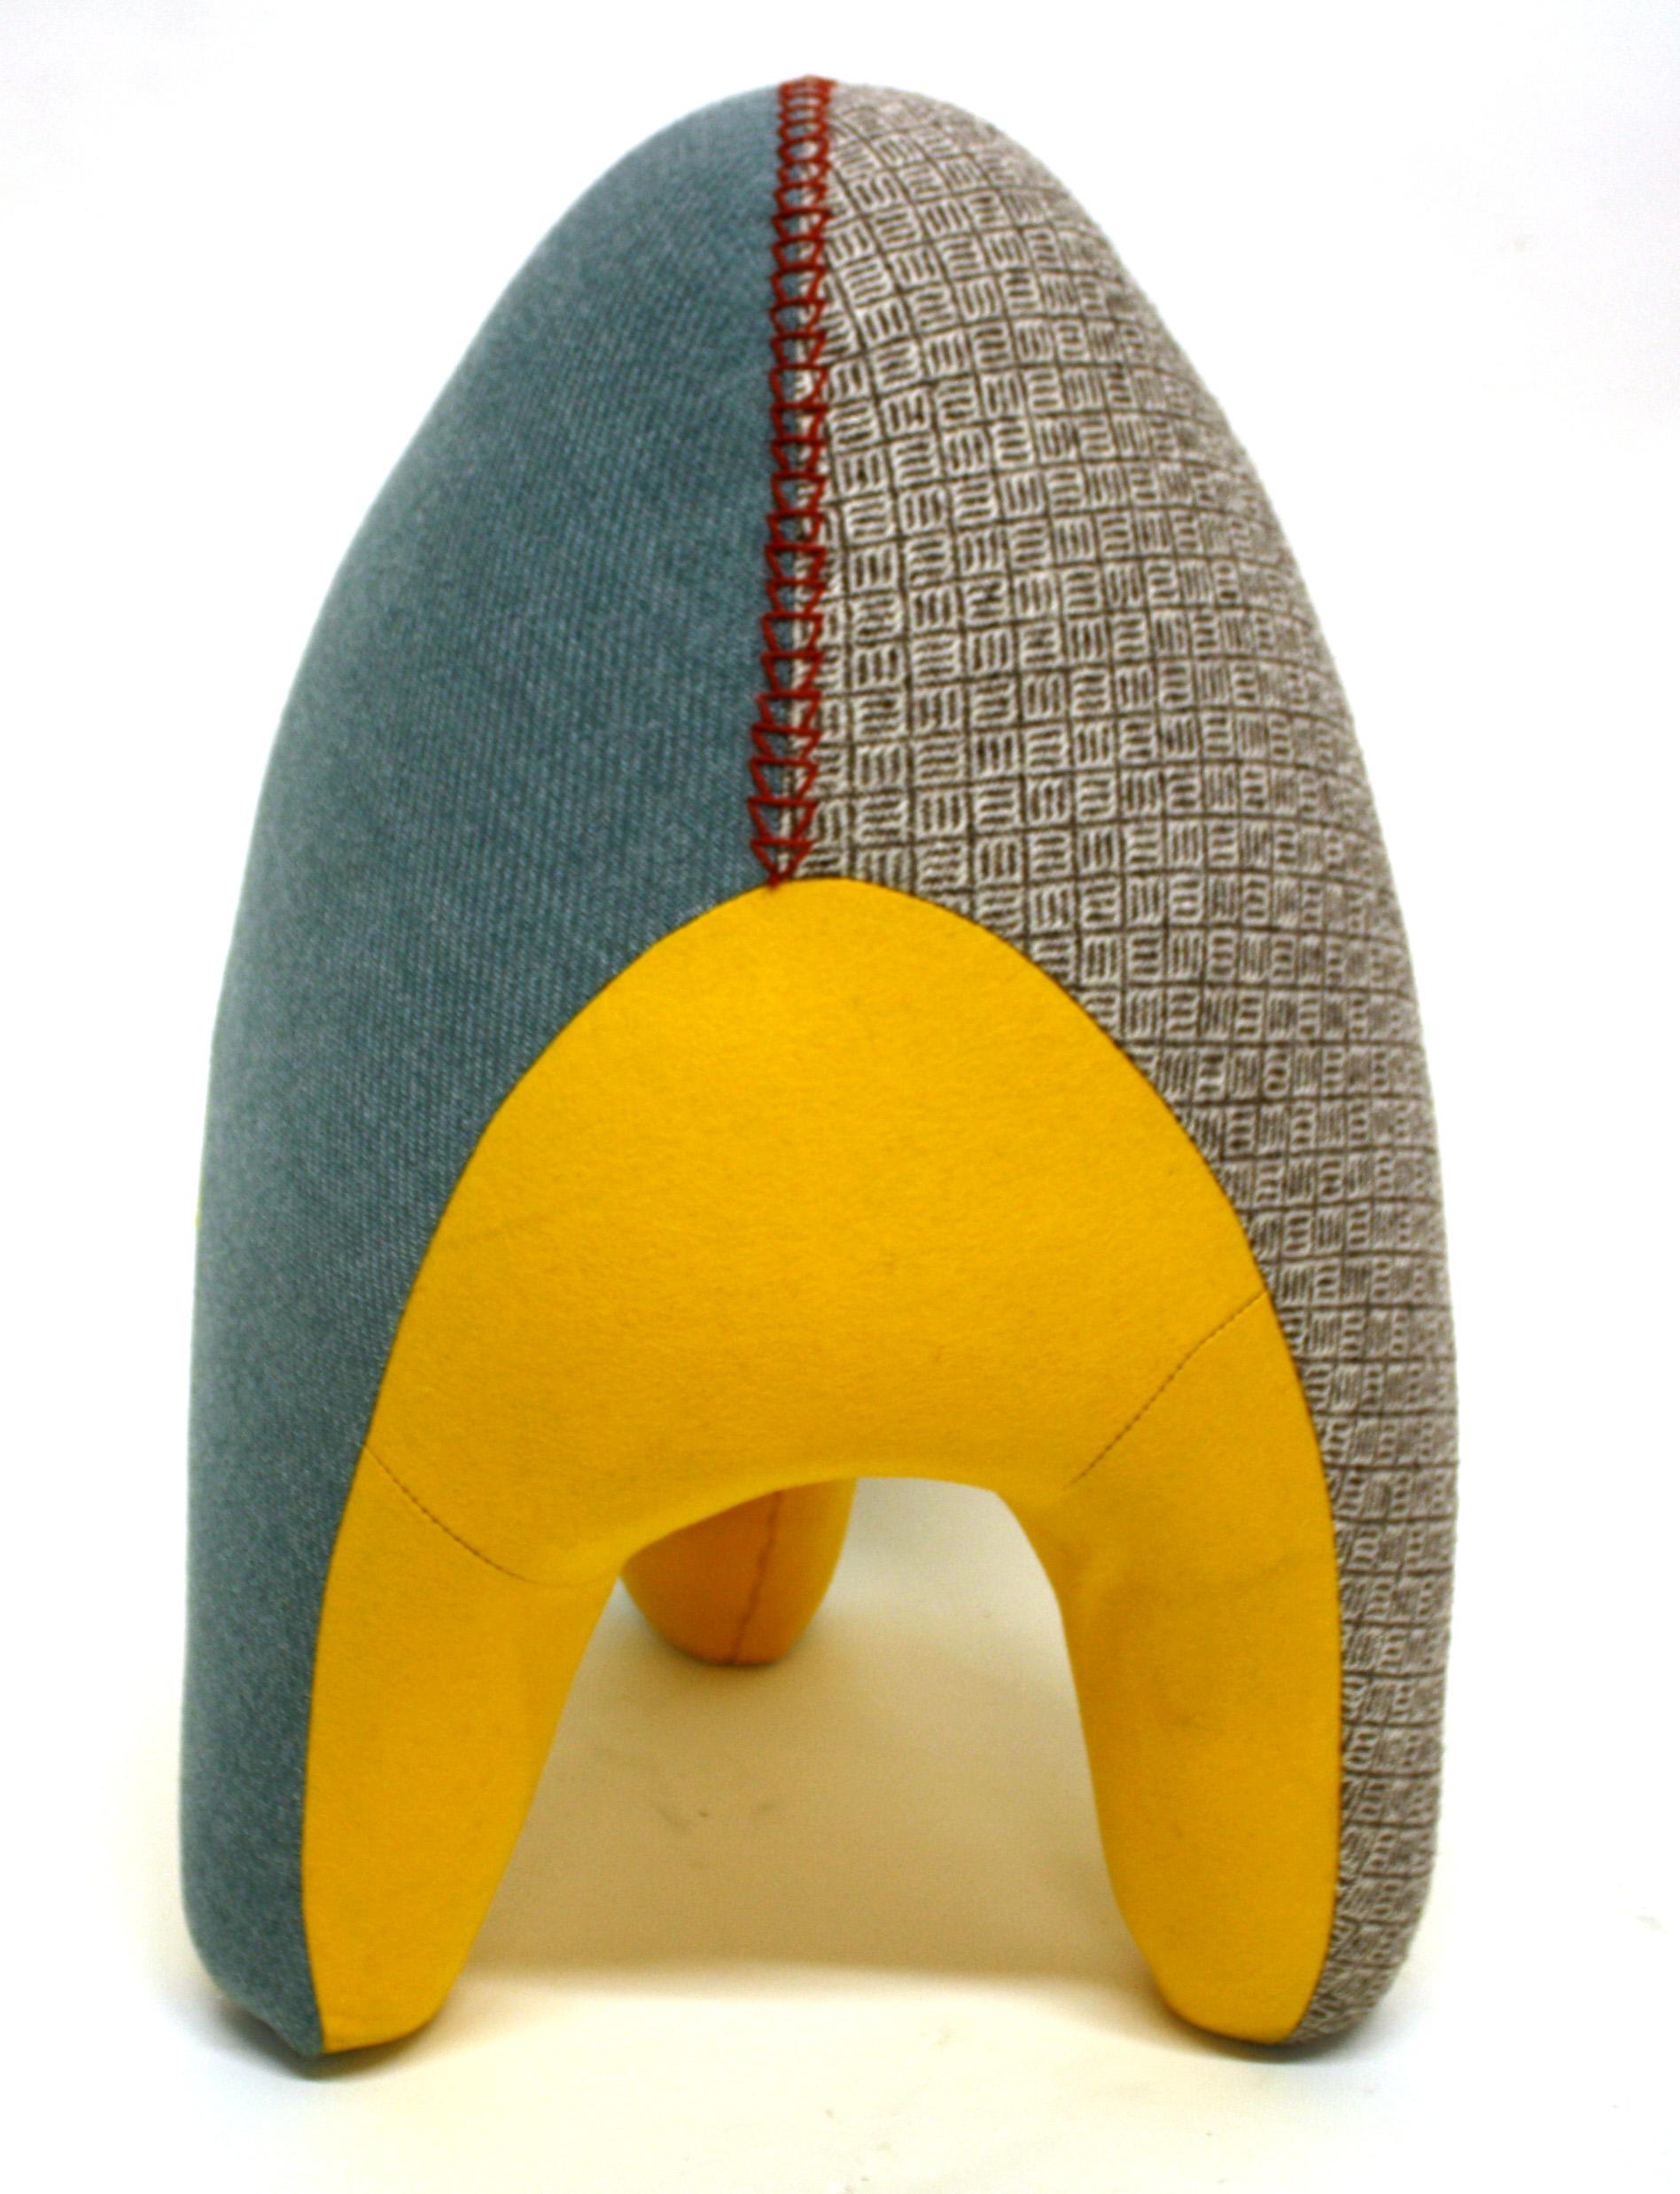 Eggbert , 2012  Vintage linen weave, woven wool, industrial felt